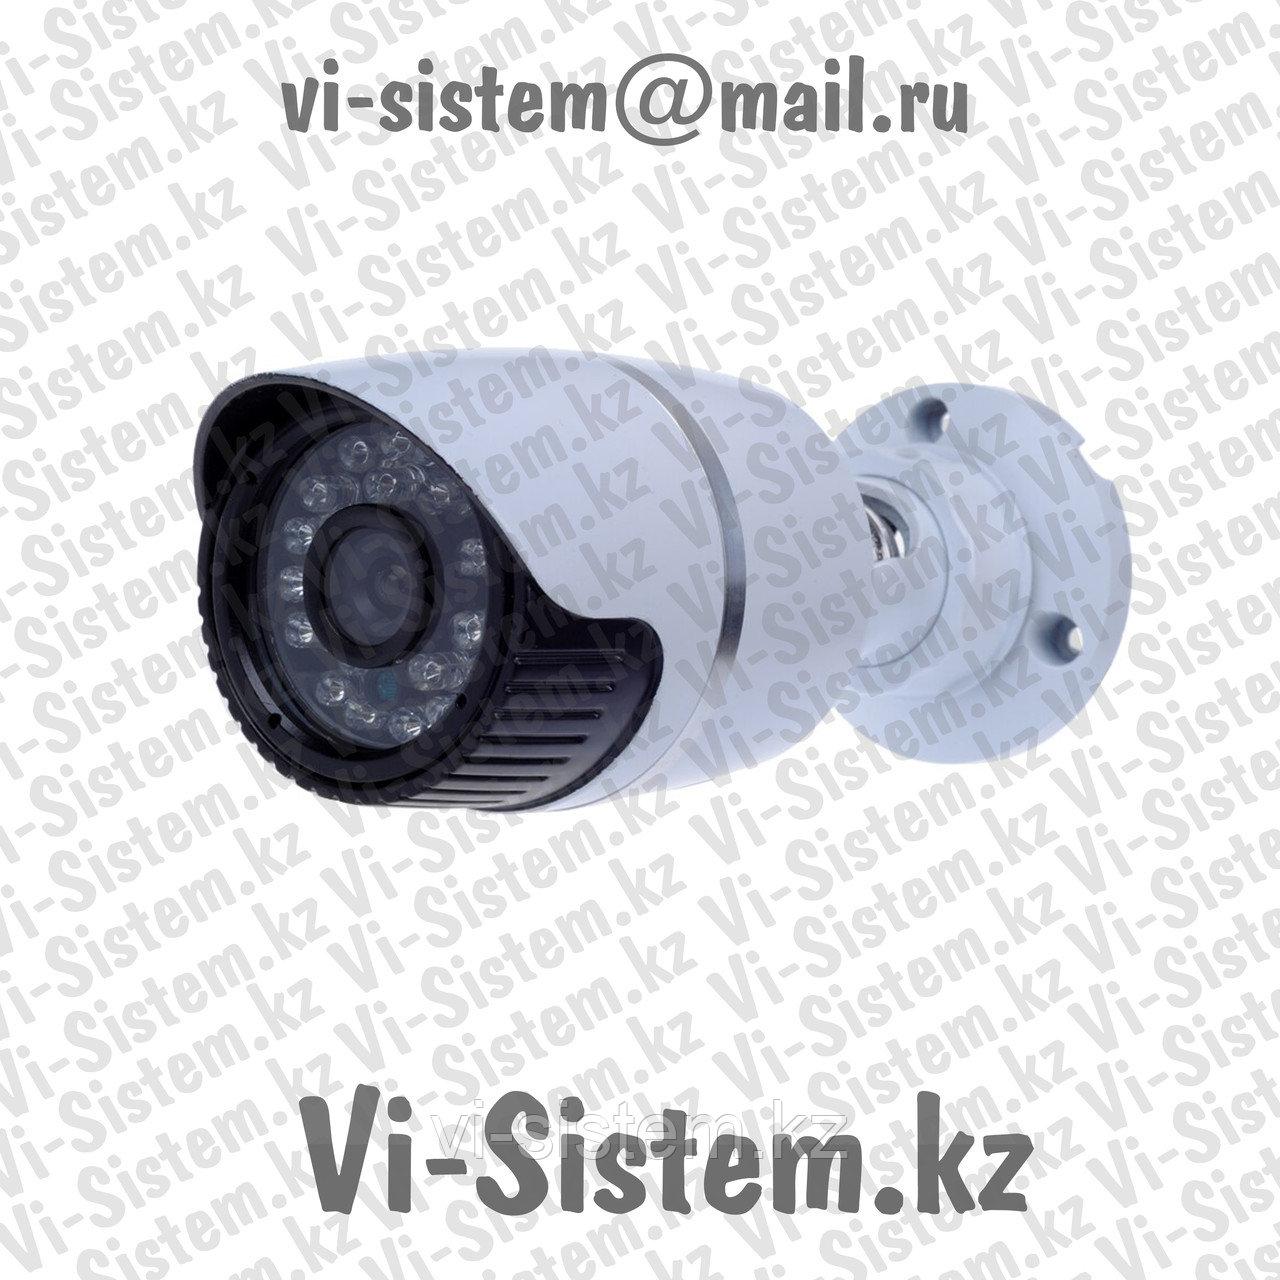 IP-Видеокамера SYNQAR IP-291 2MP